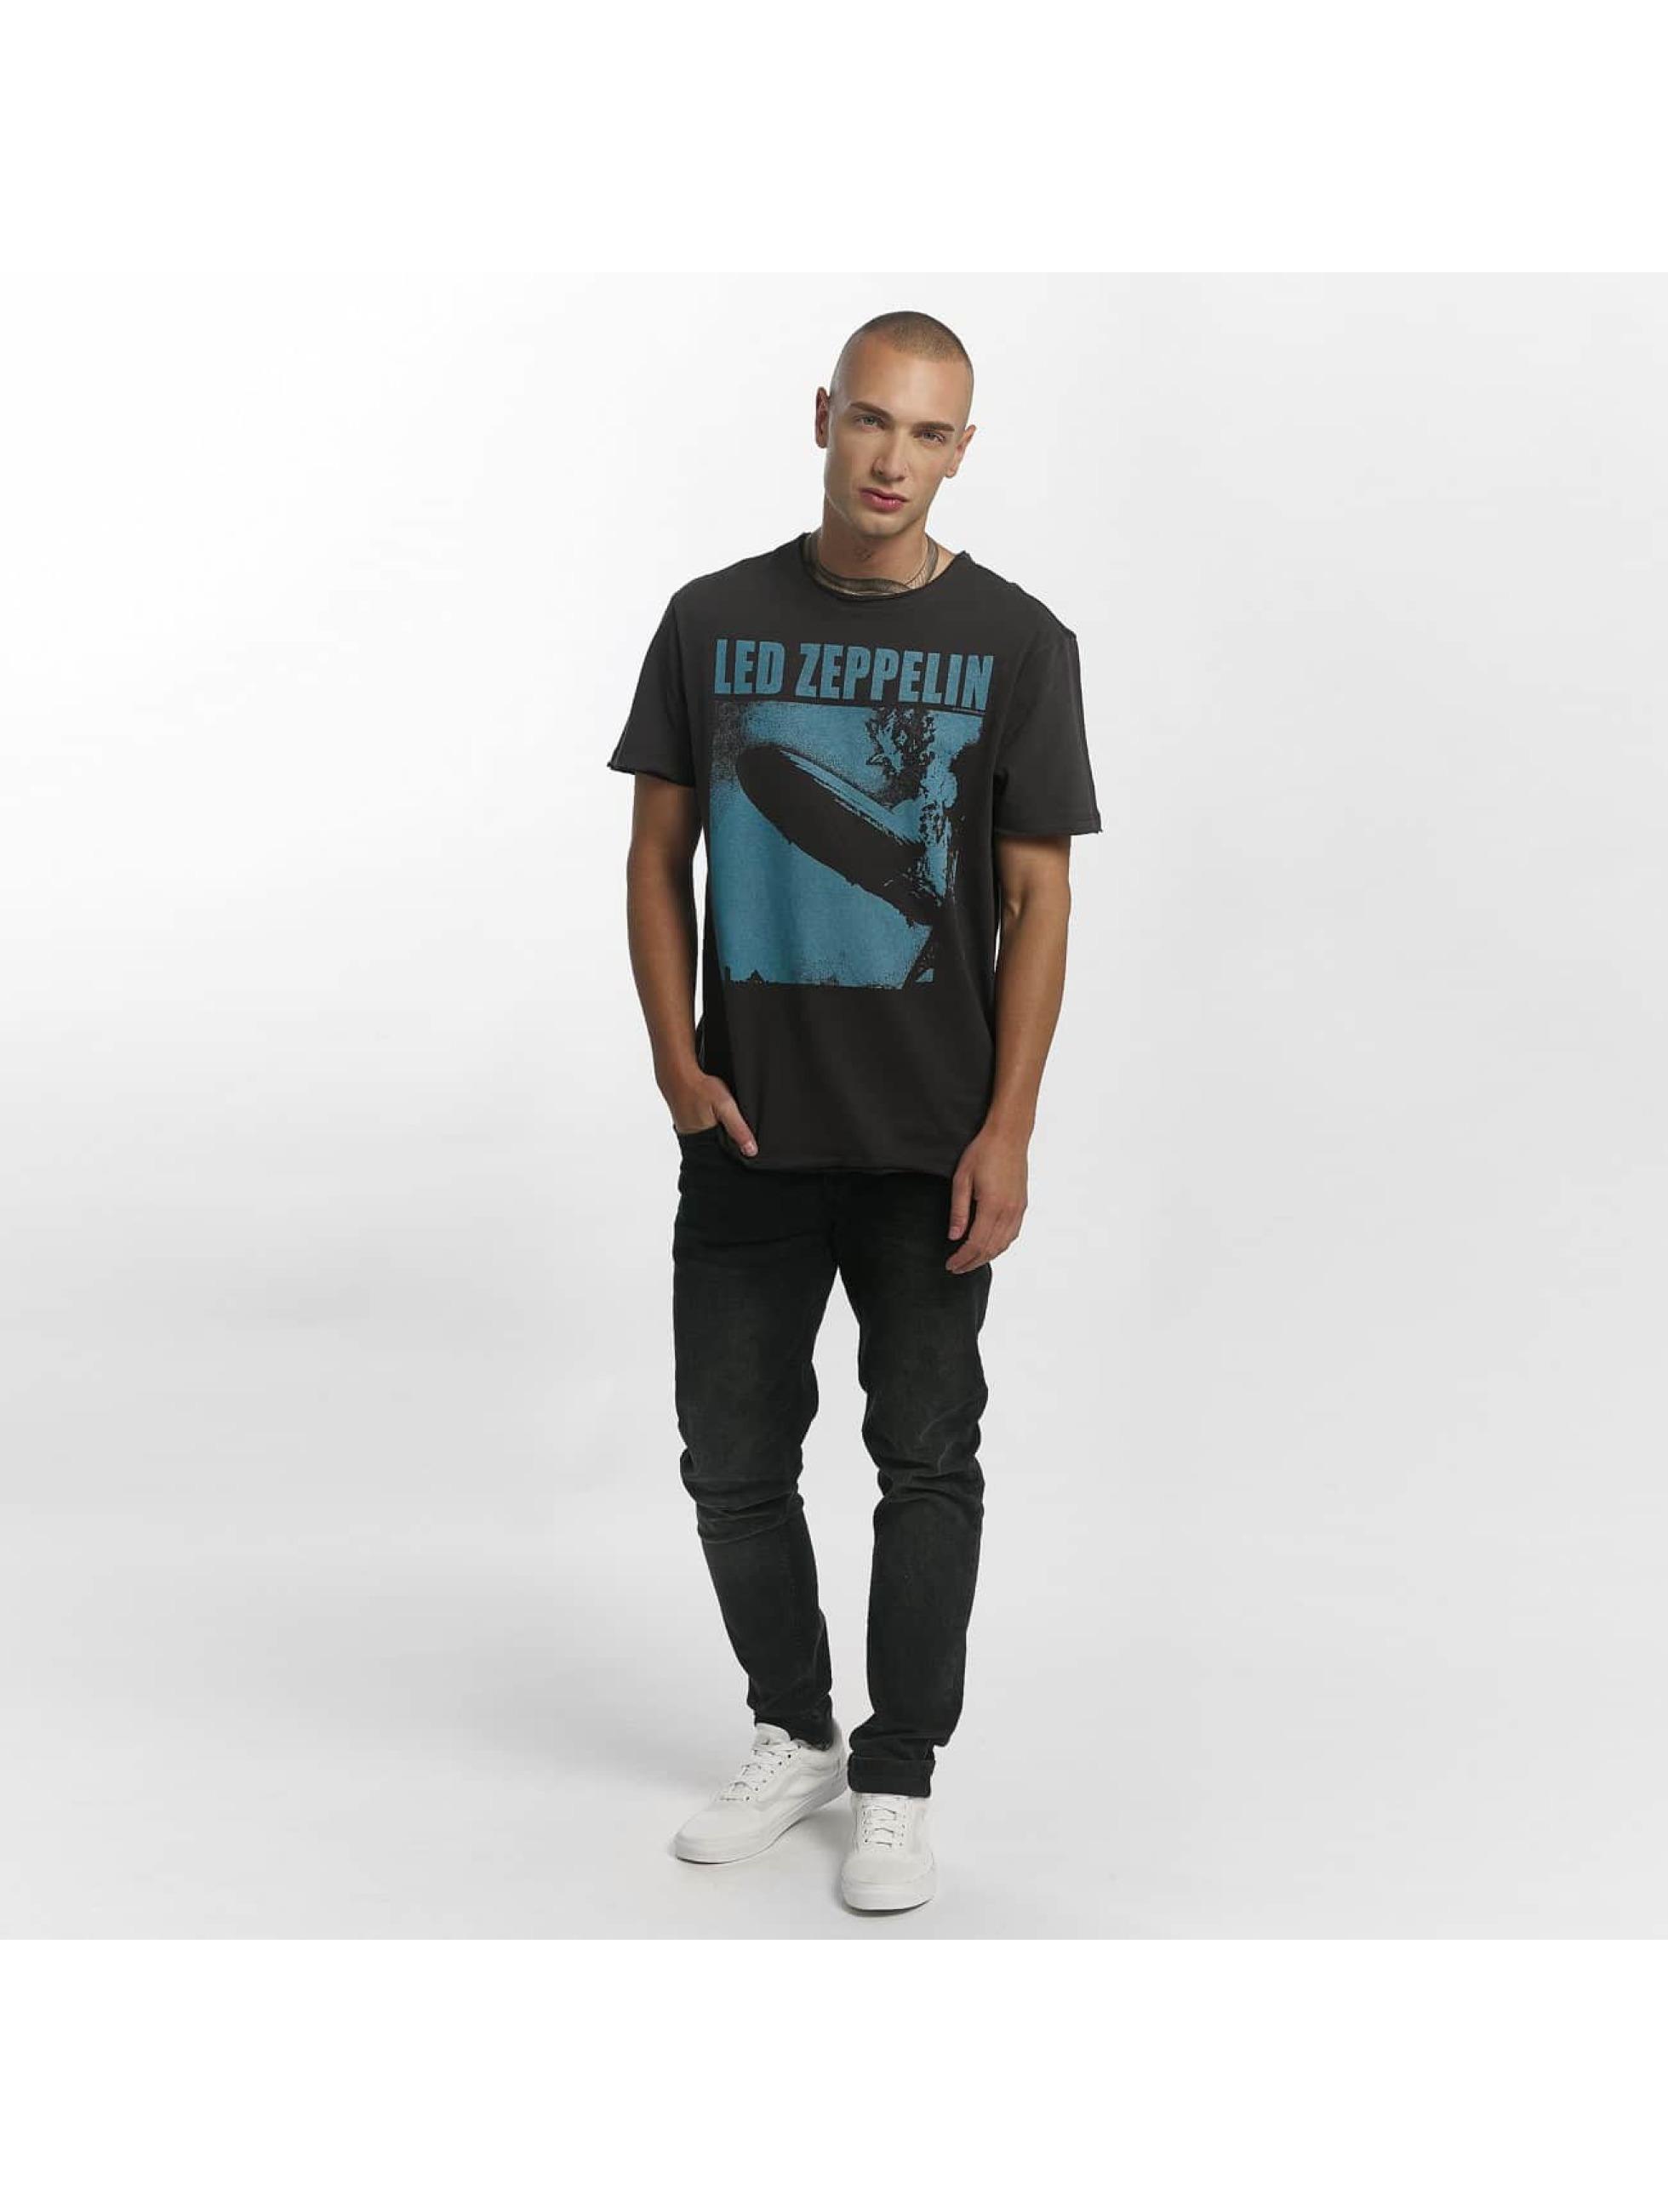 Amplified T-Shirt Led Zeppelin Blimp Square gray